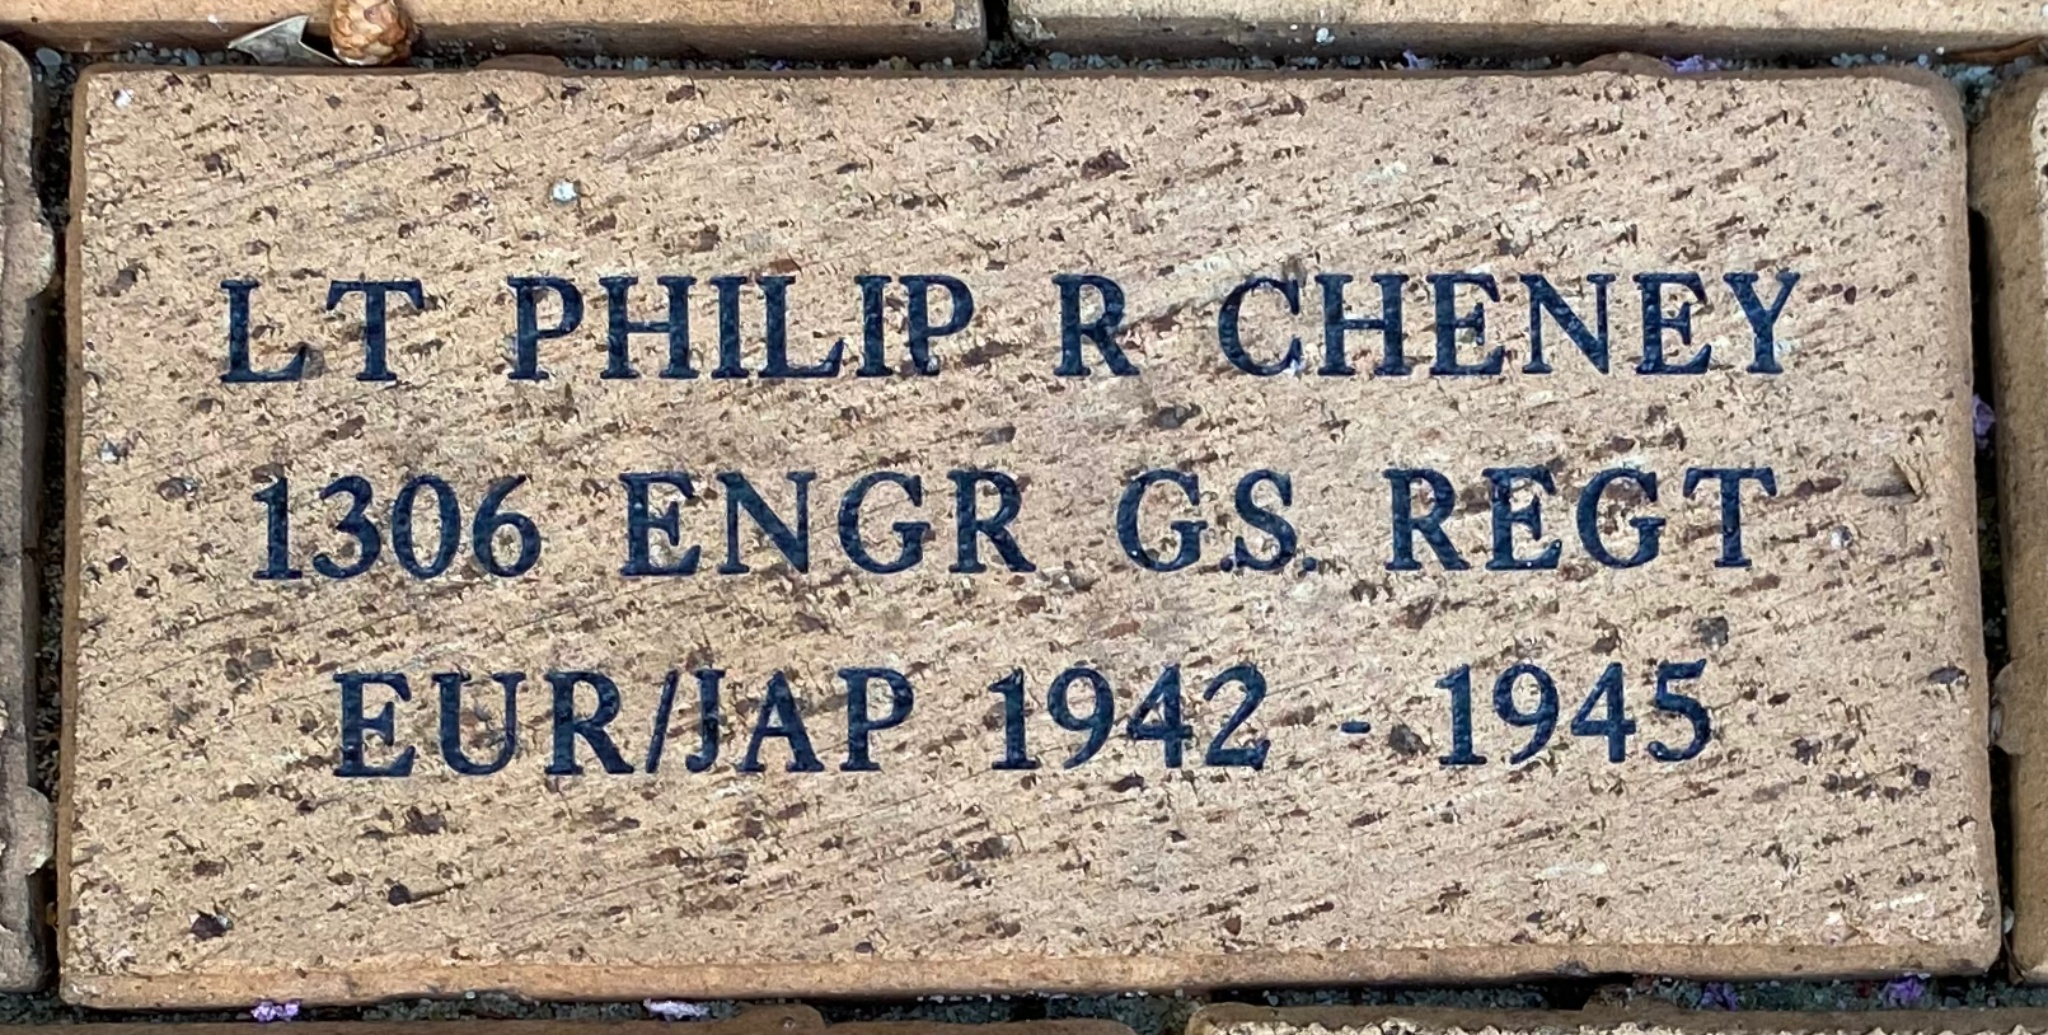 LT PHILIP R CHENEY 1306 ENGR GS REGT EUR/JAP 1942 – 1945